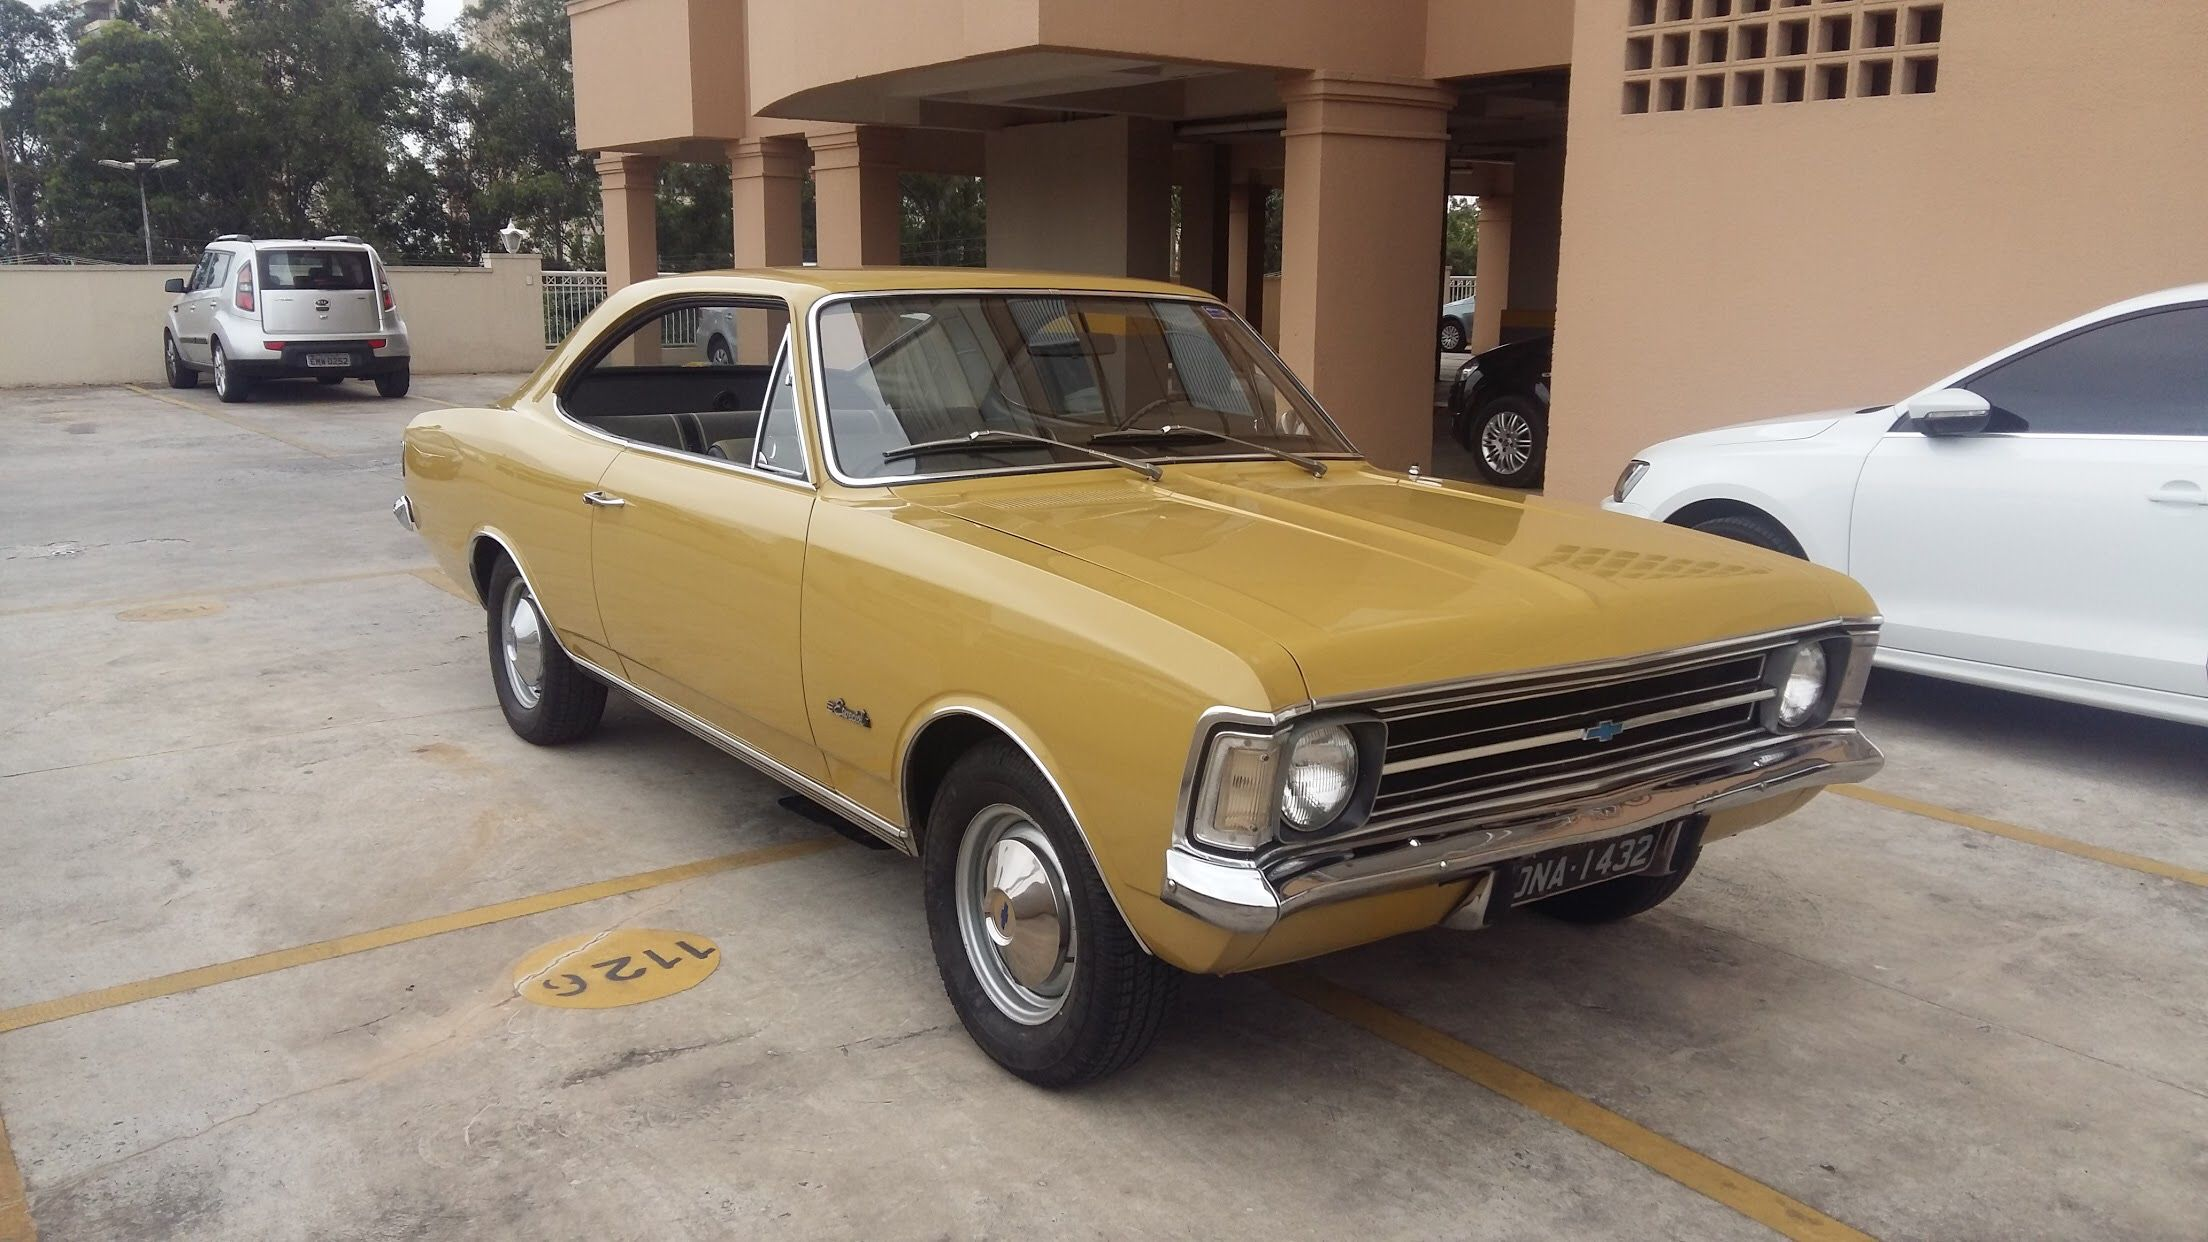 Pin De Arthur Cabrera Em My Cars Chevrolet Opala Opala Opala